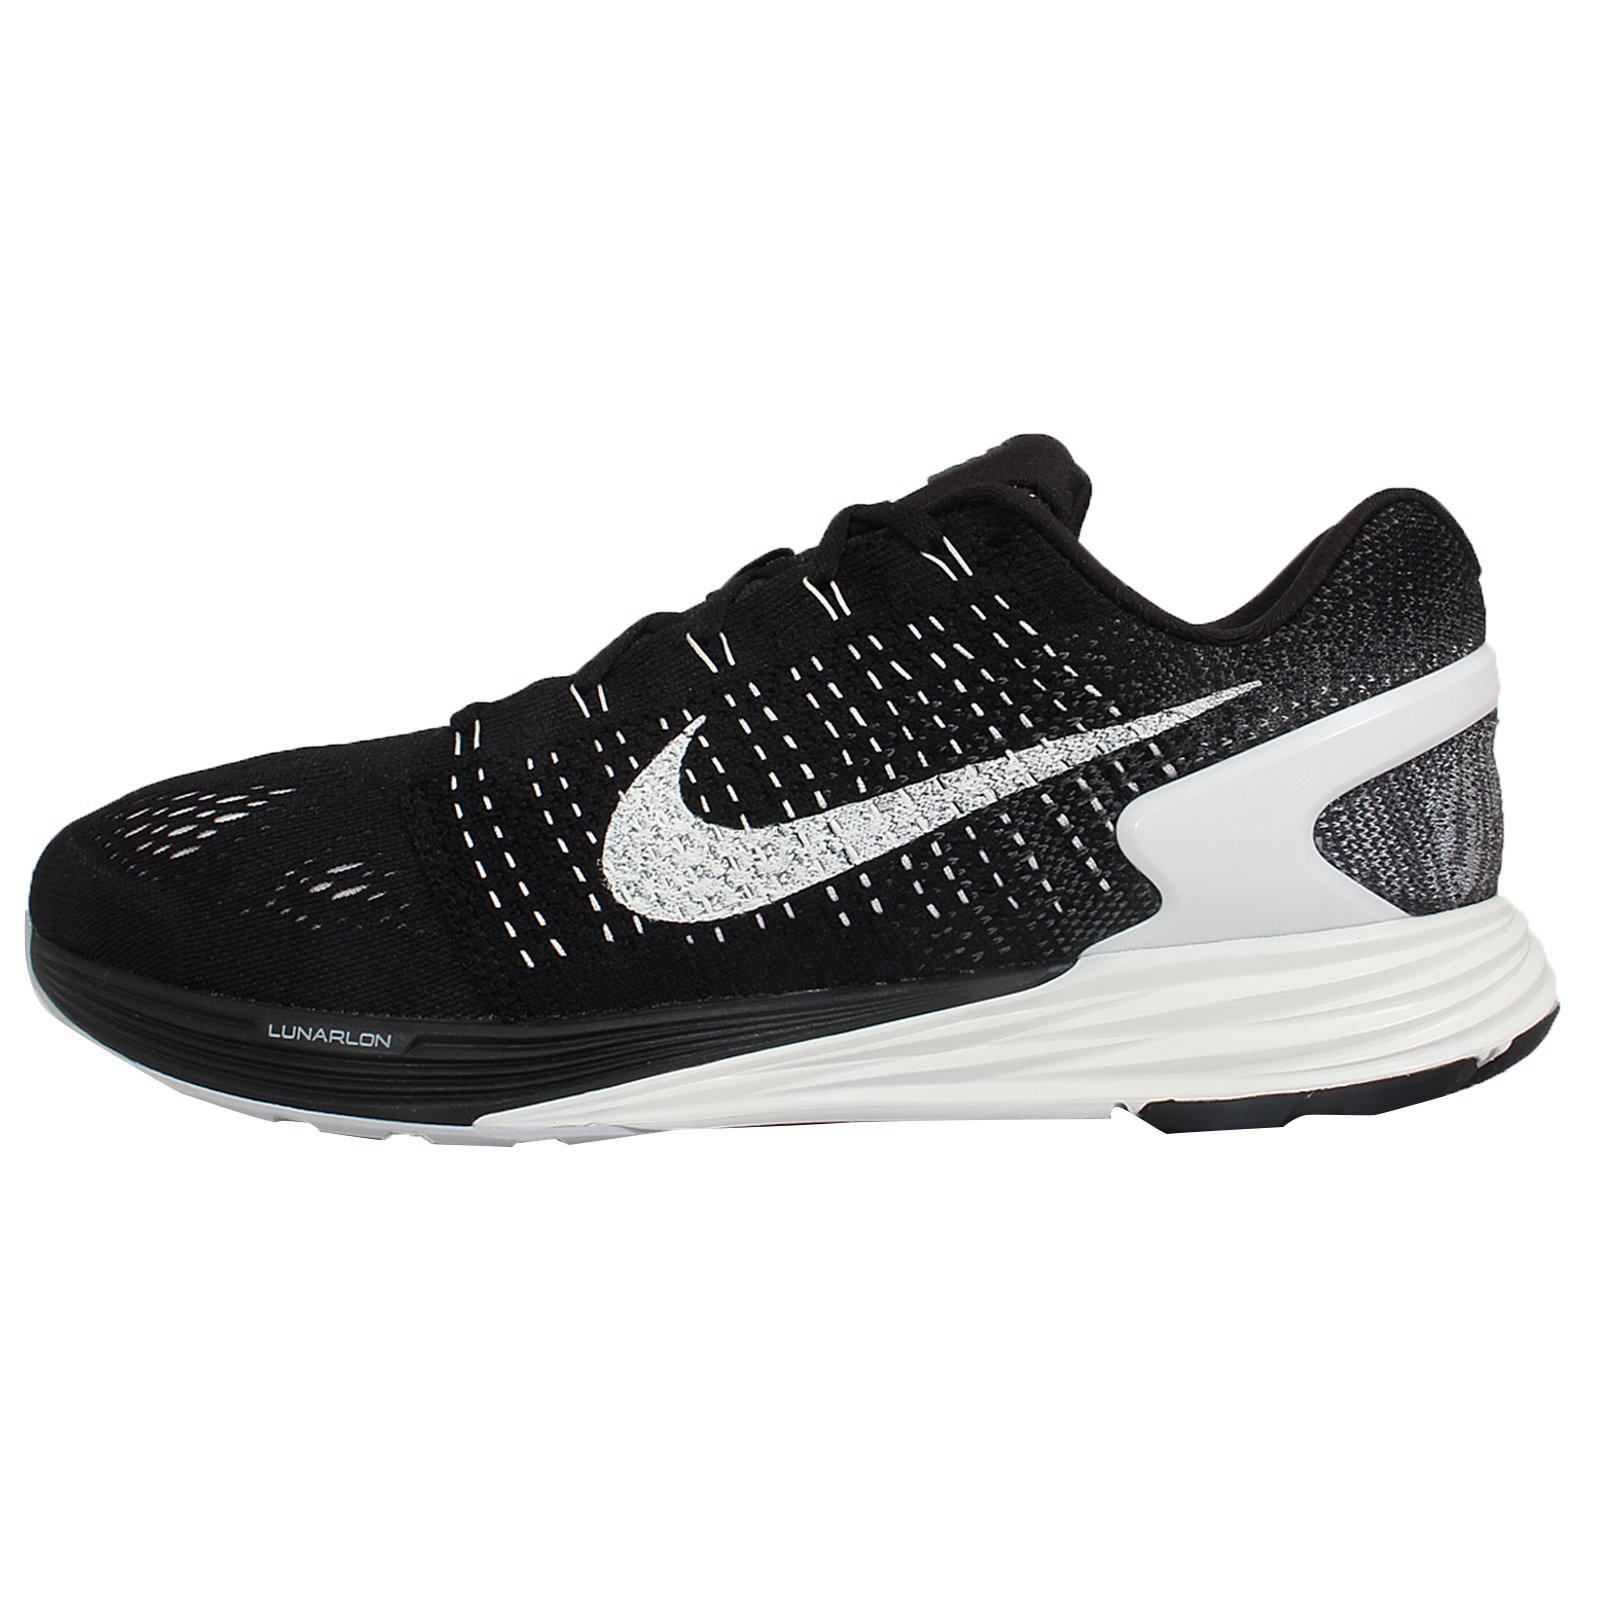 1e52d28f52aff Galleon - Nike Men s Lunarglide 7 Black Summit White Anthracite Running Shoe  11.5 Men US